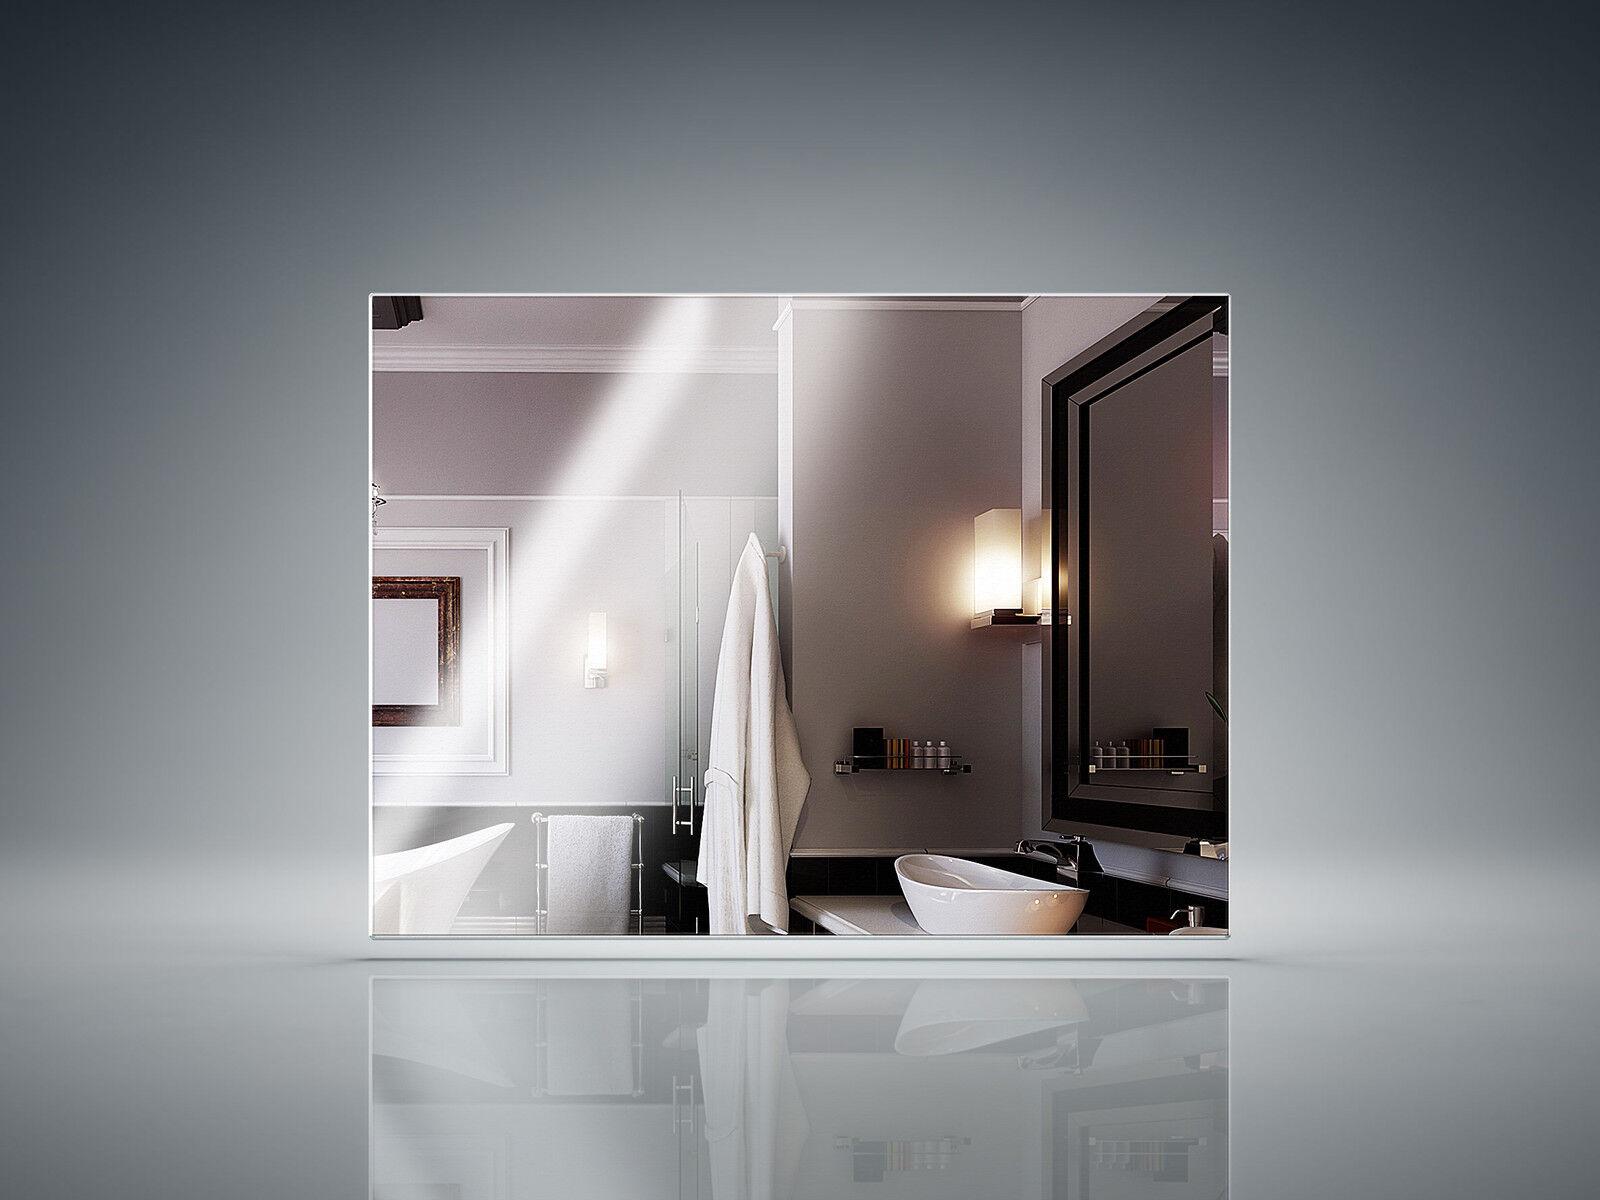 Spiegelfliesen Wandfliesen Fliesen Spiegel ■■■ 6 mm Spiegel Glasstärke